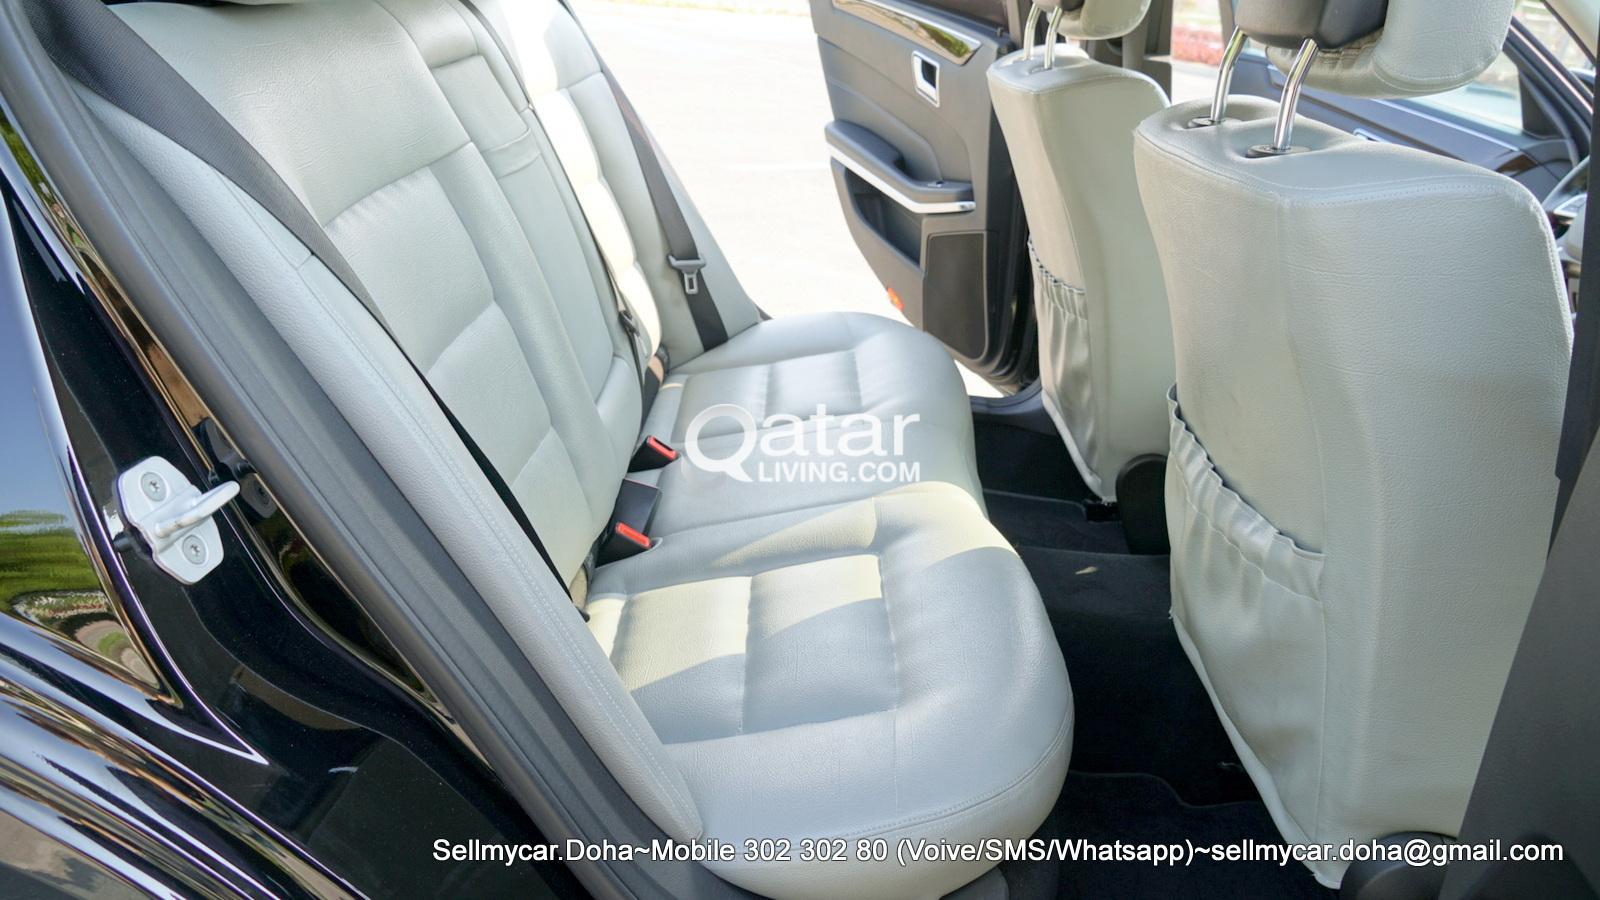 2014 Mercedes Benz E 200 (Mid Options) More Photos